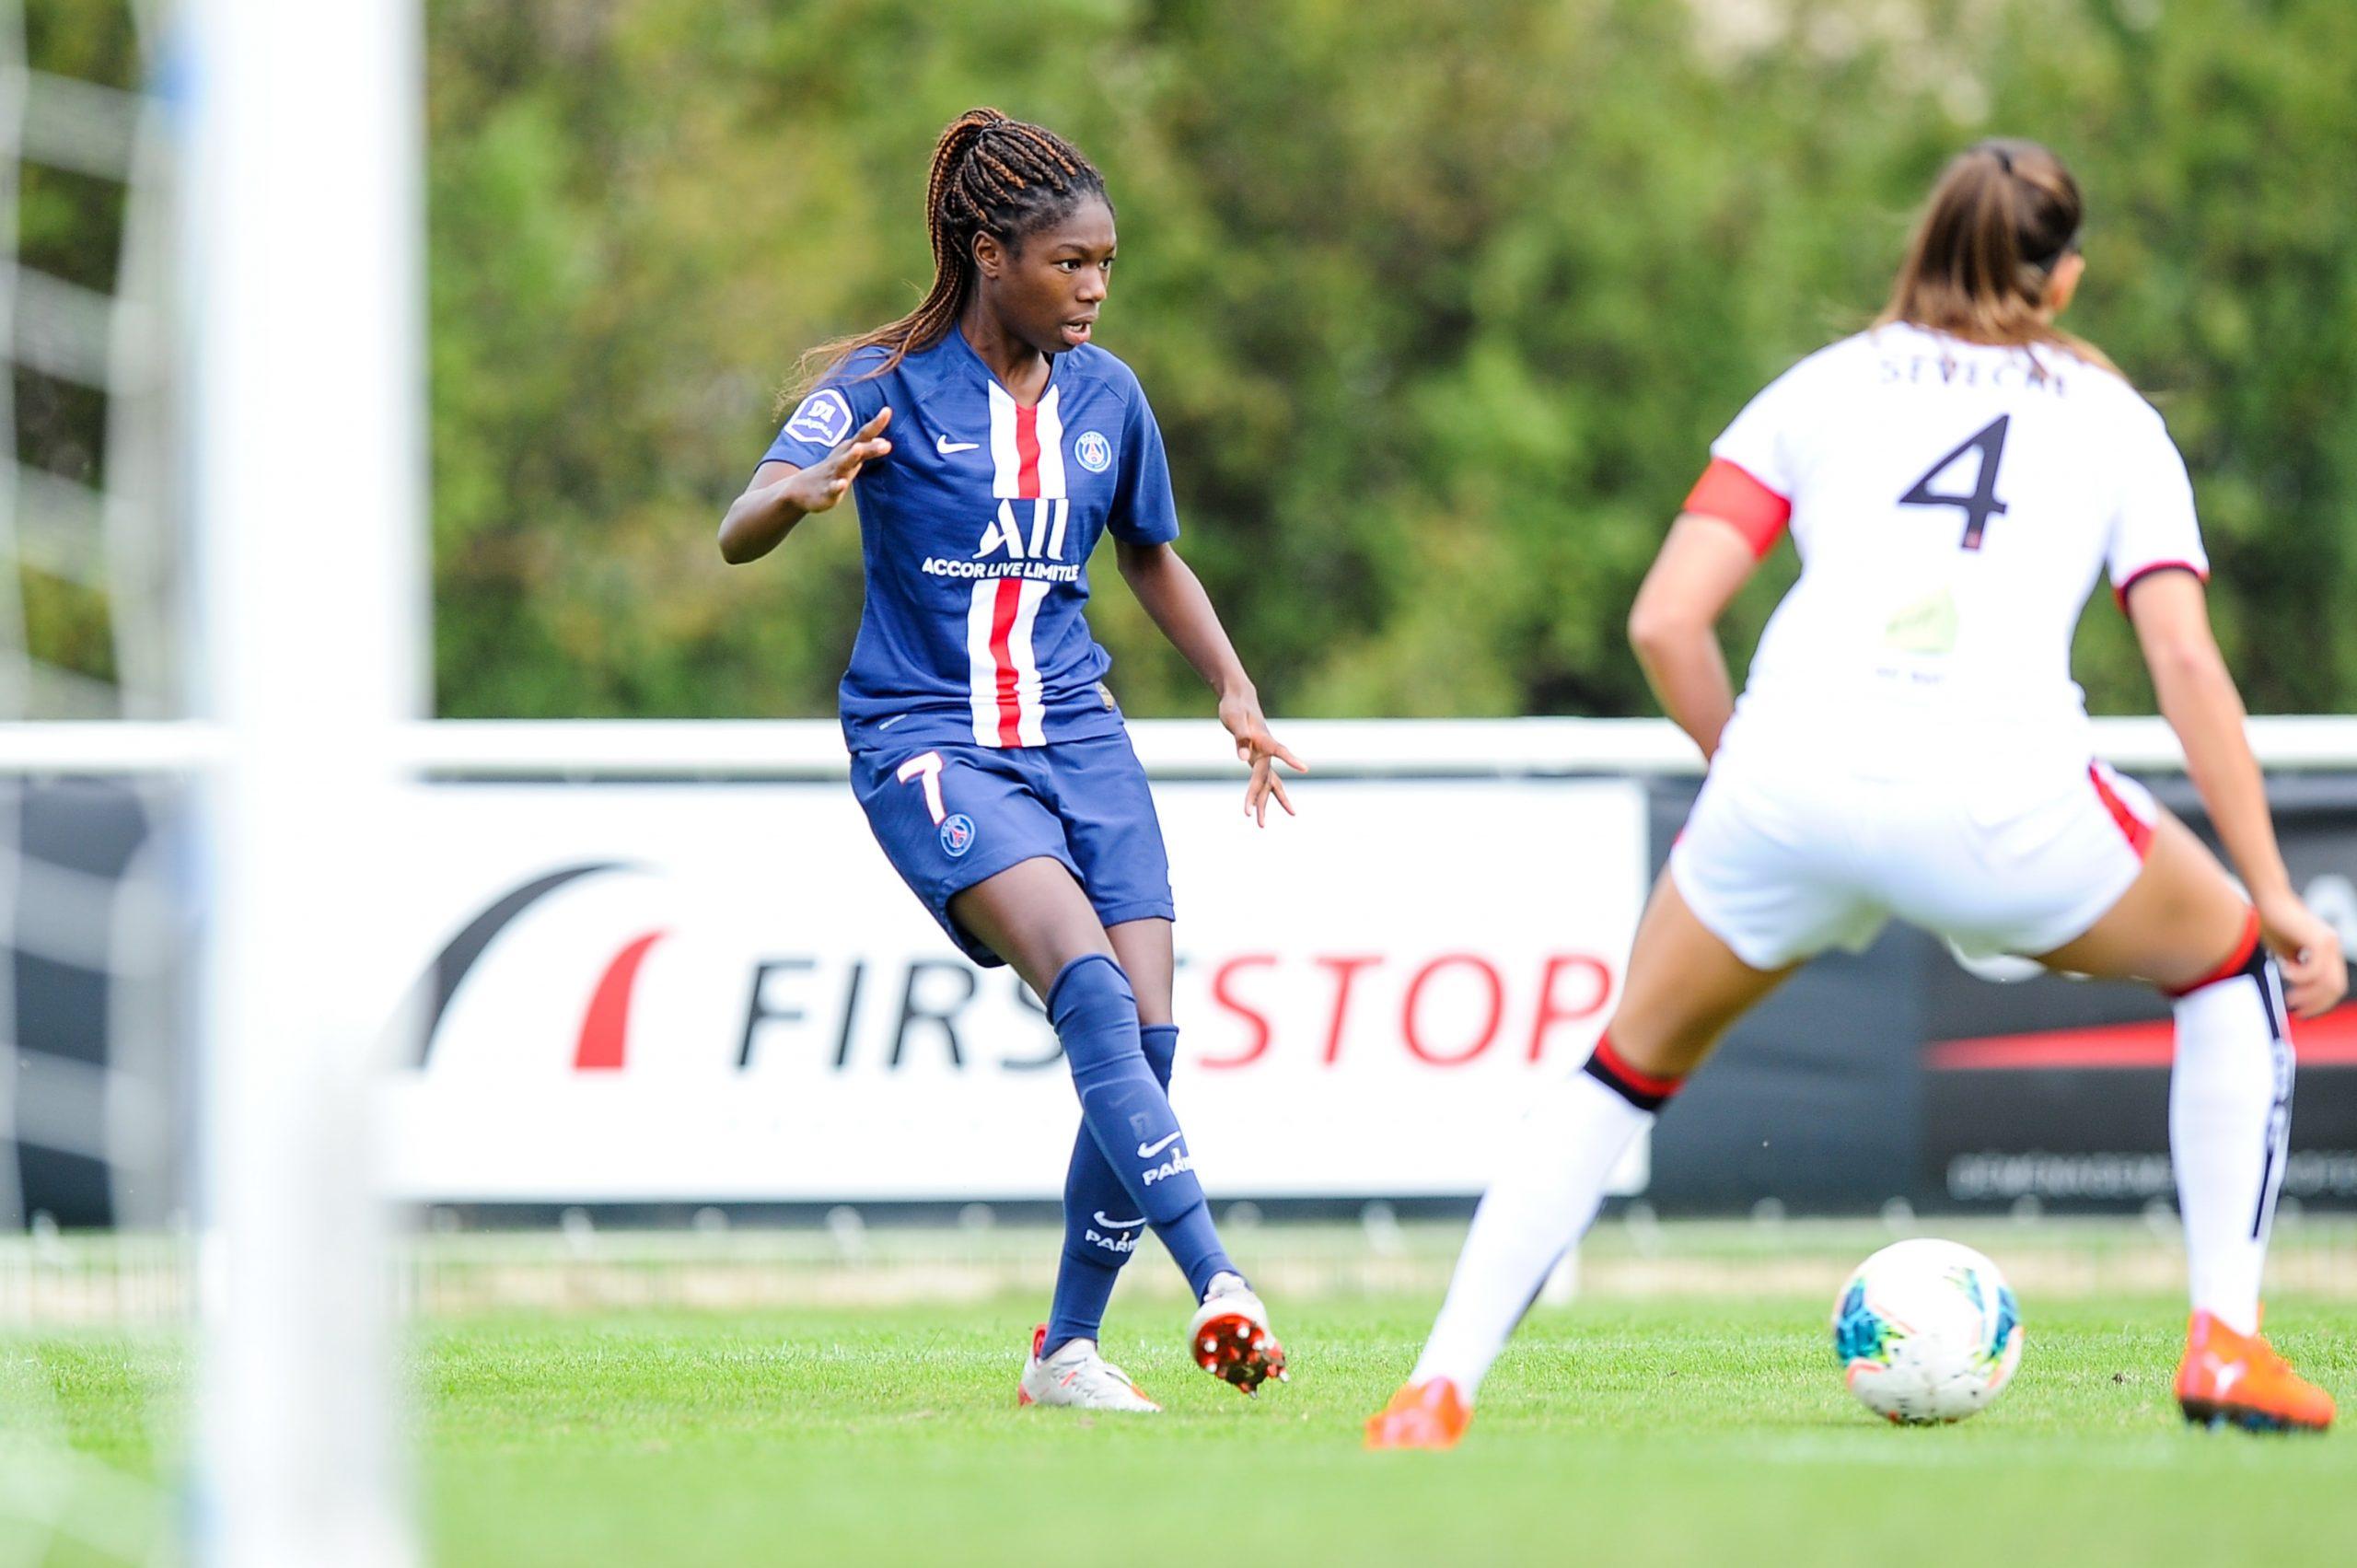 Mercato - Aminata Diallo va quitter le PSG en prêt, selon L'Equipe et RMC Sport